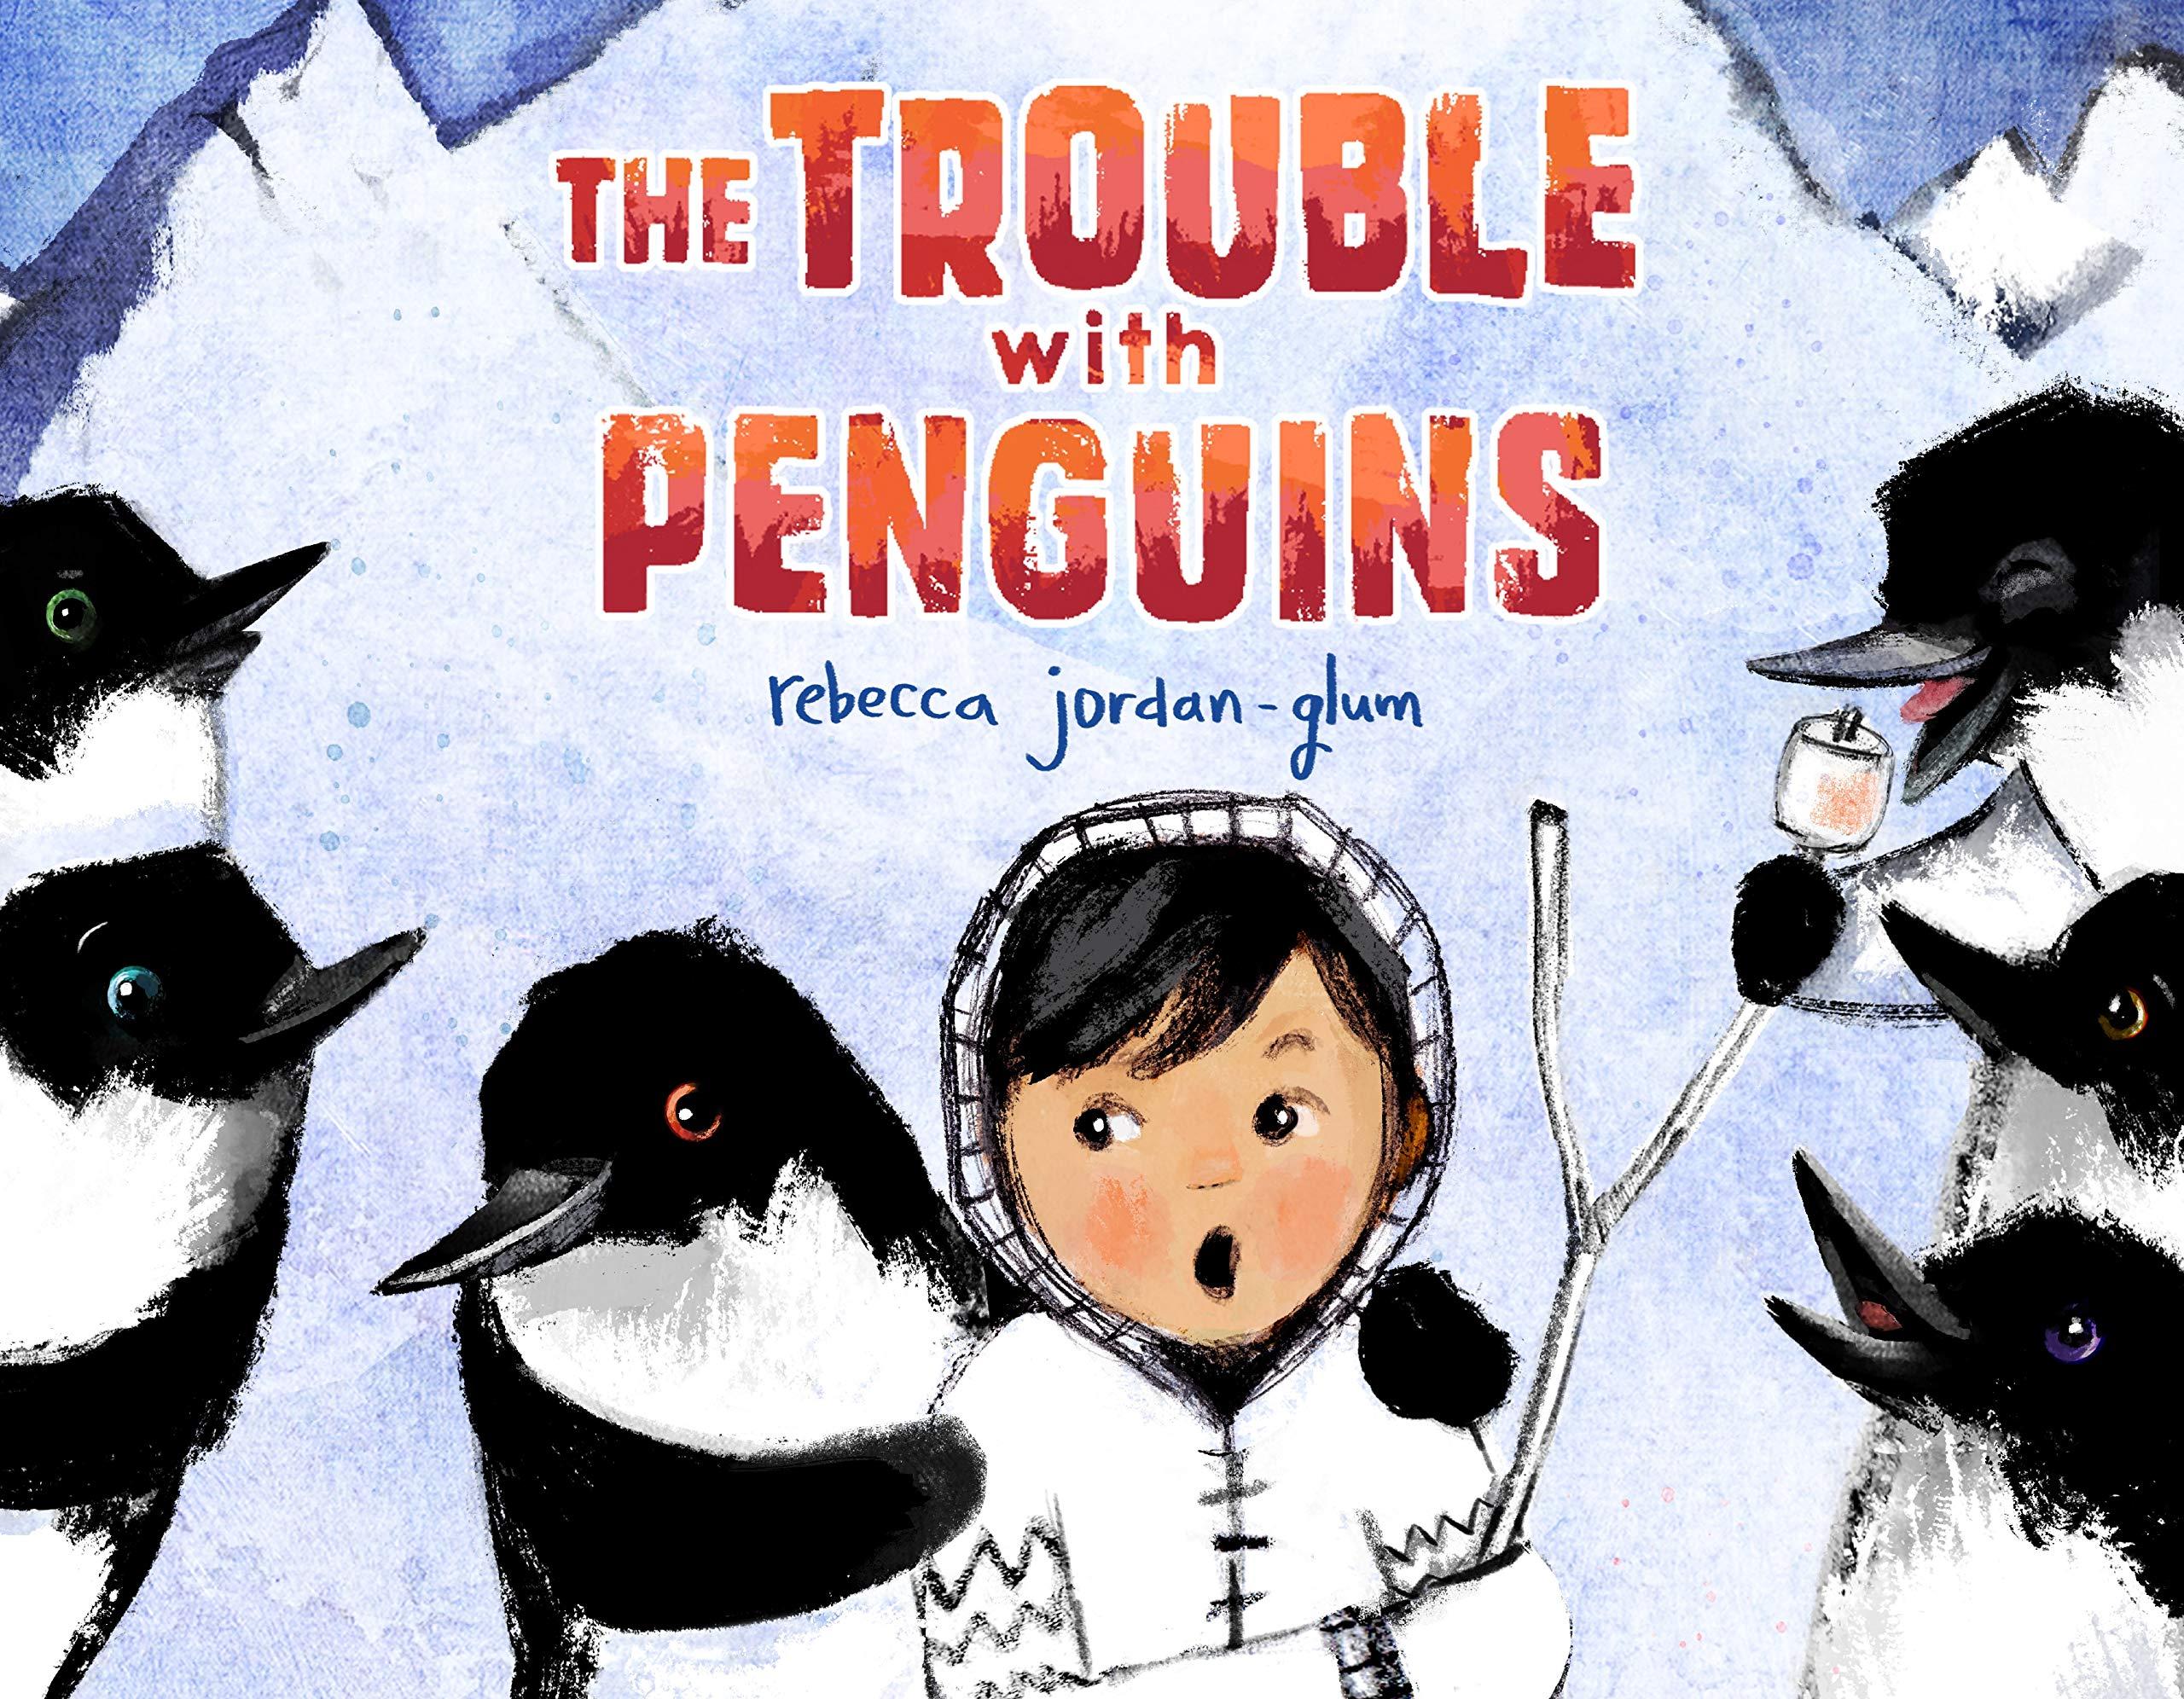 The Trouble with Penguins: Jordan-Glum, Rebecca, Jordan-Glum, Rebecca: 9781250208484: Amazon.com: Books